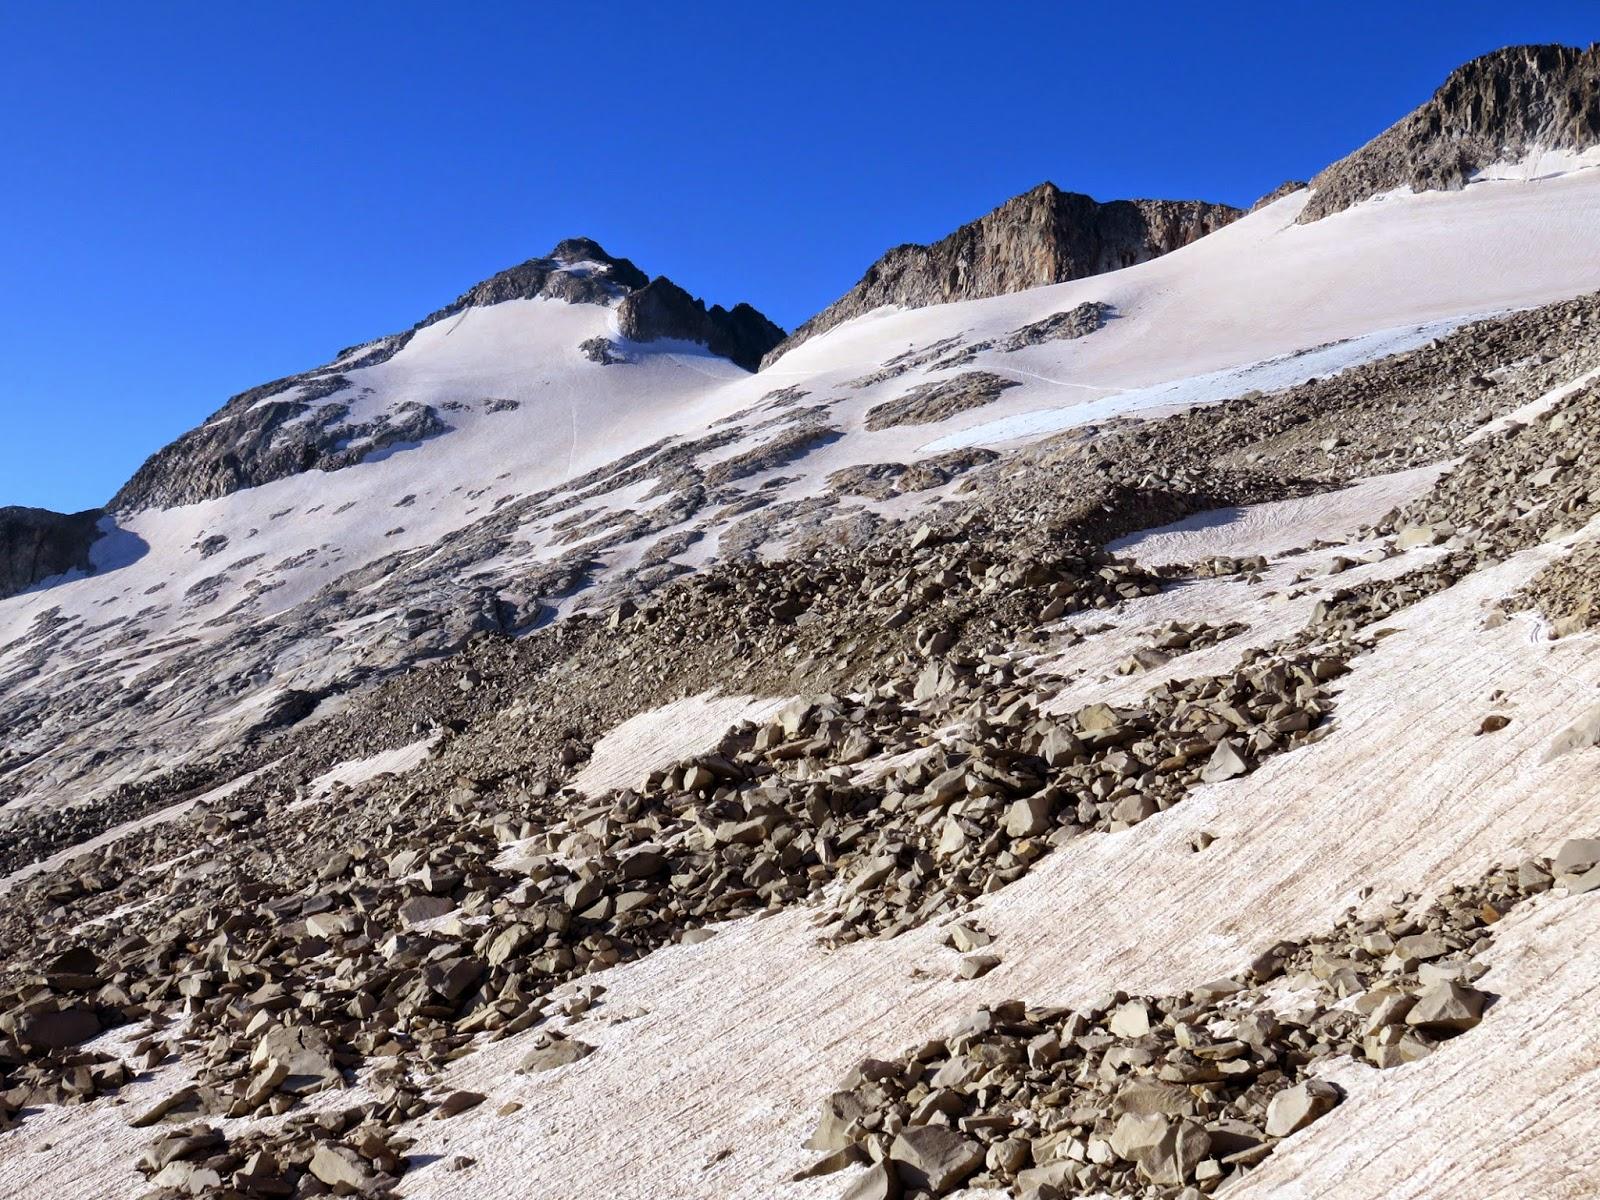 Pico Aneto y Glaciar del Aneto desde Portillon Superior